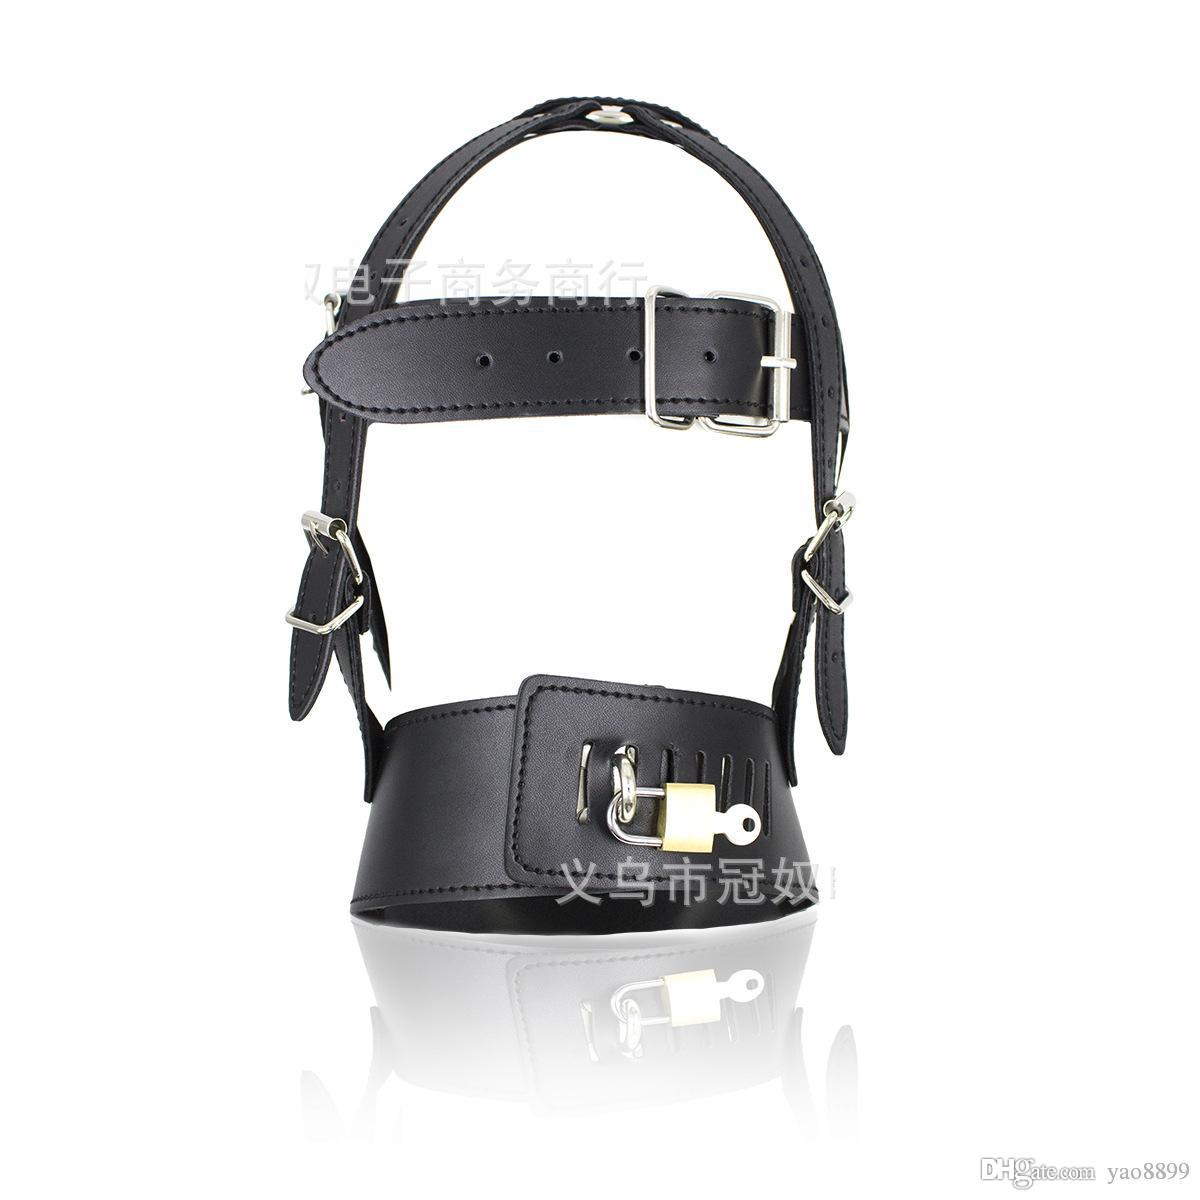 BDSM Sex Toys Black Leather Head Harness With Muzzle Leather Muzzle Bondage Restraint Gear Adult Sex Product A990